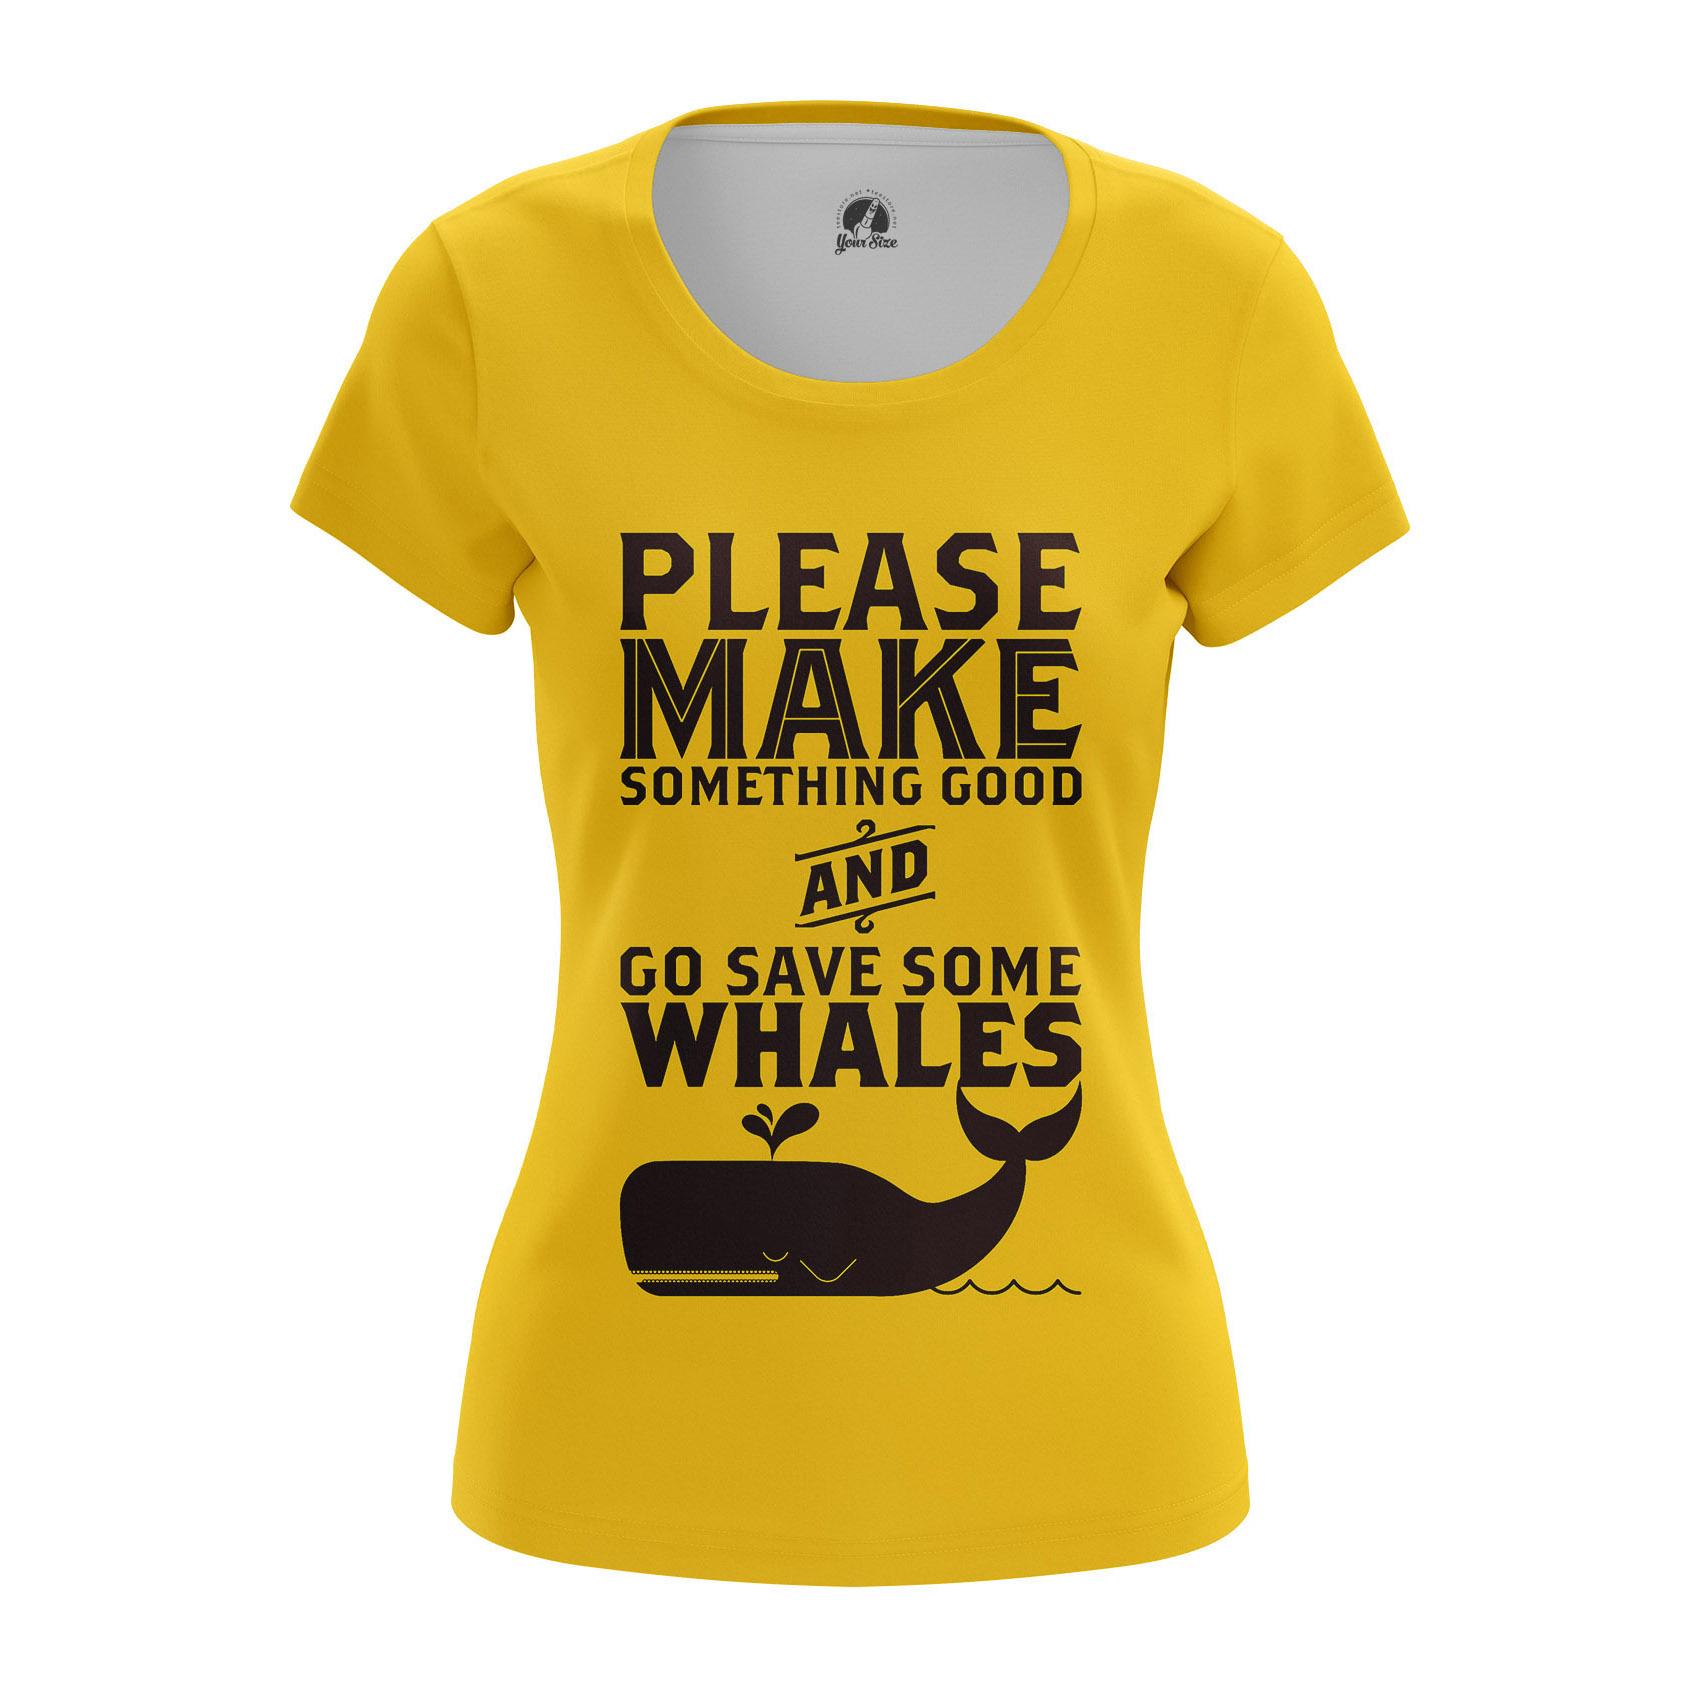 W-Tee-Savesomewhales_1482275416_529